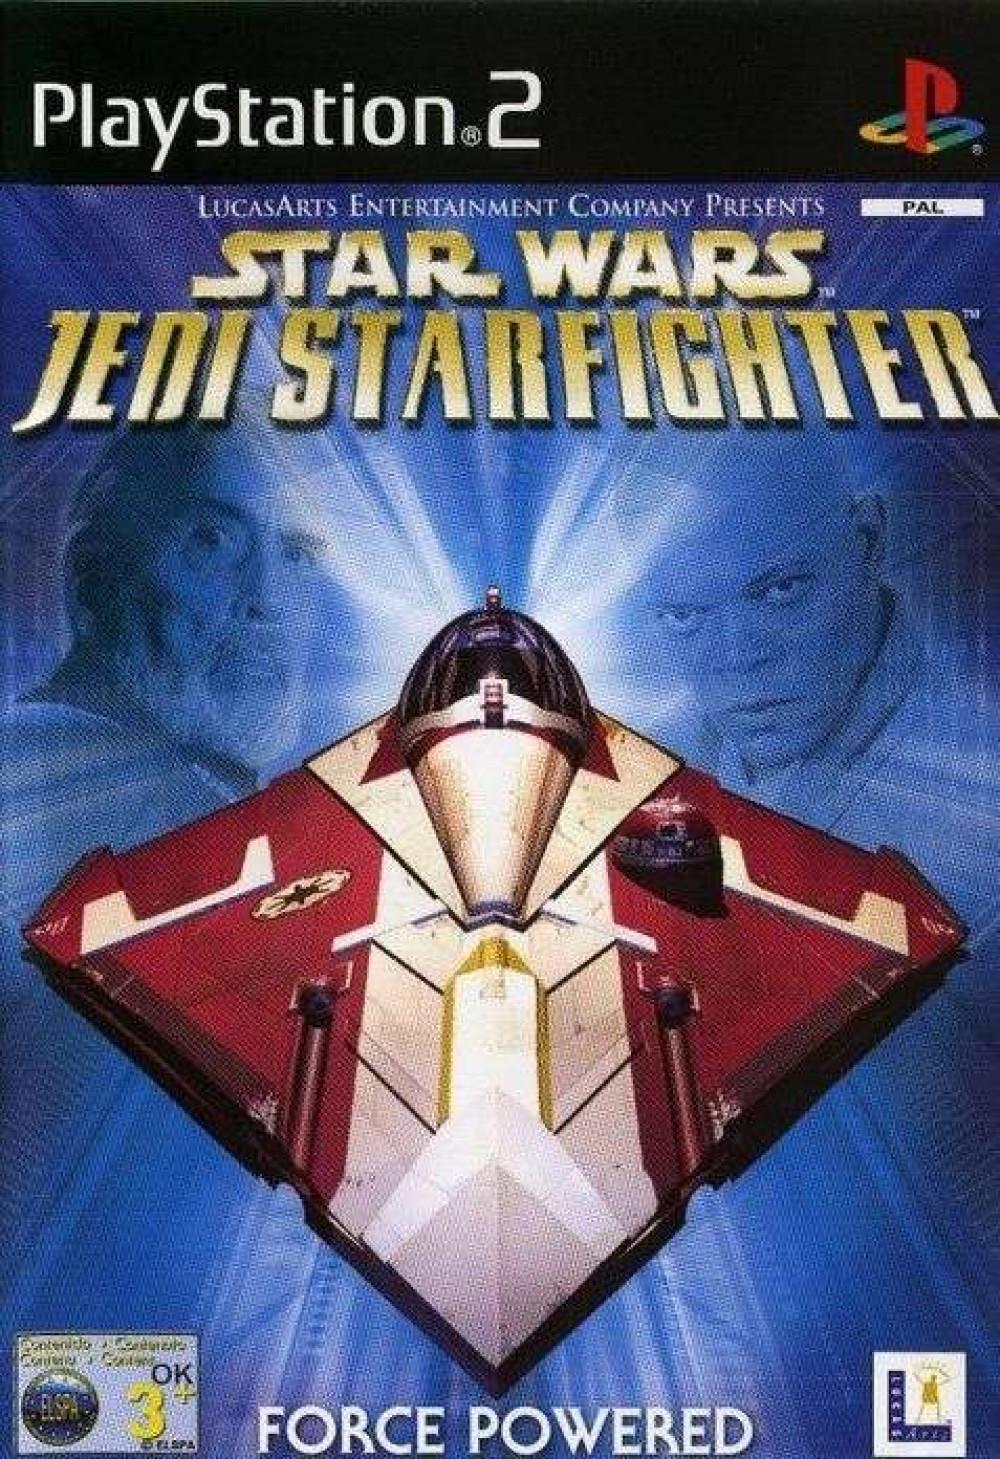 PS2 STAR WARS JEDI STARFIGHTER